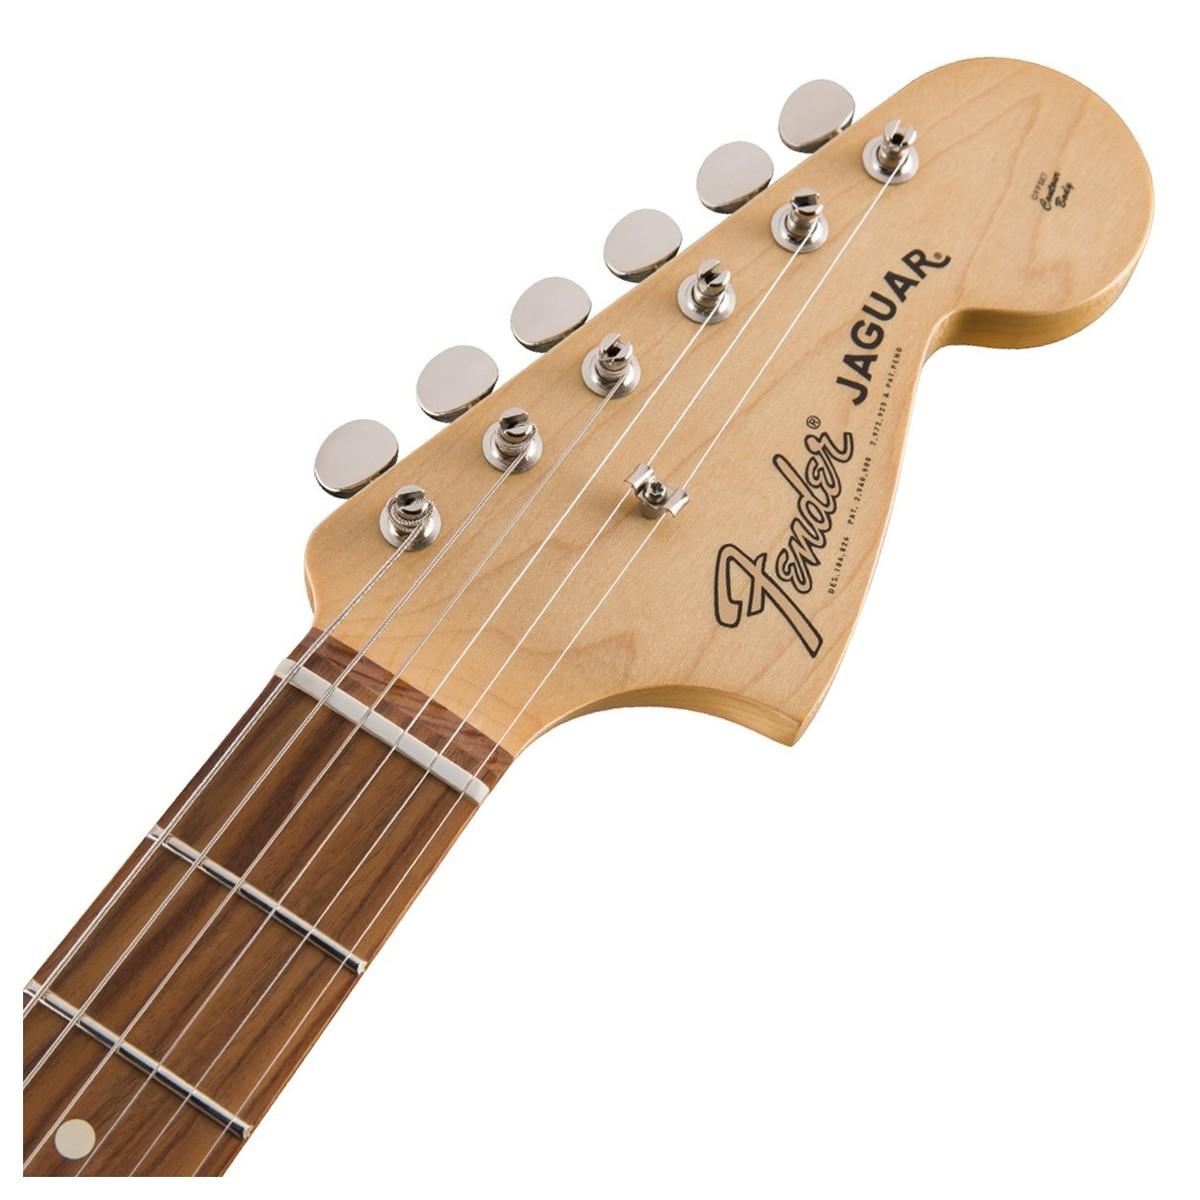 fender jaguar classic player guitar pau ferro candy apple red at gear4music. Black Bedroom Furniture Sets. Home Design Ideas